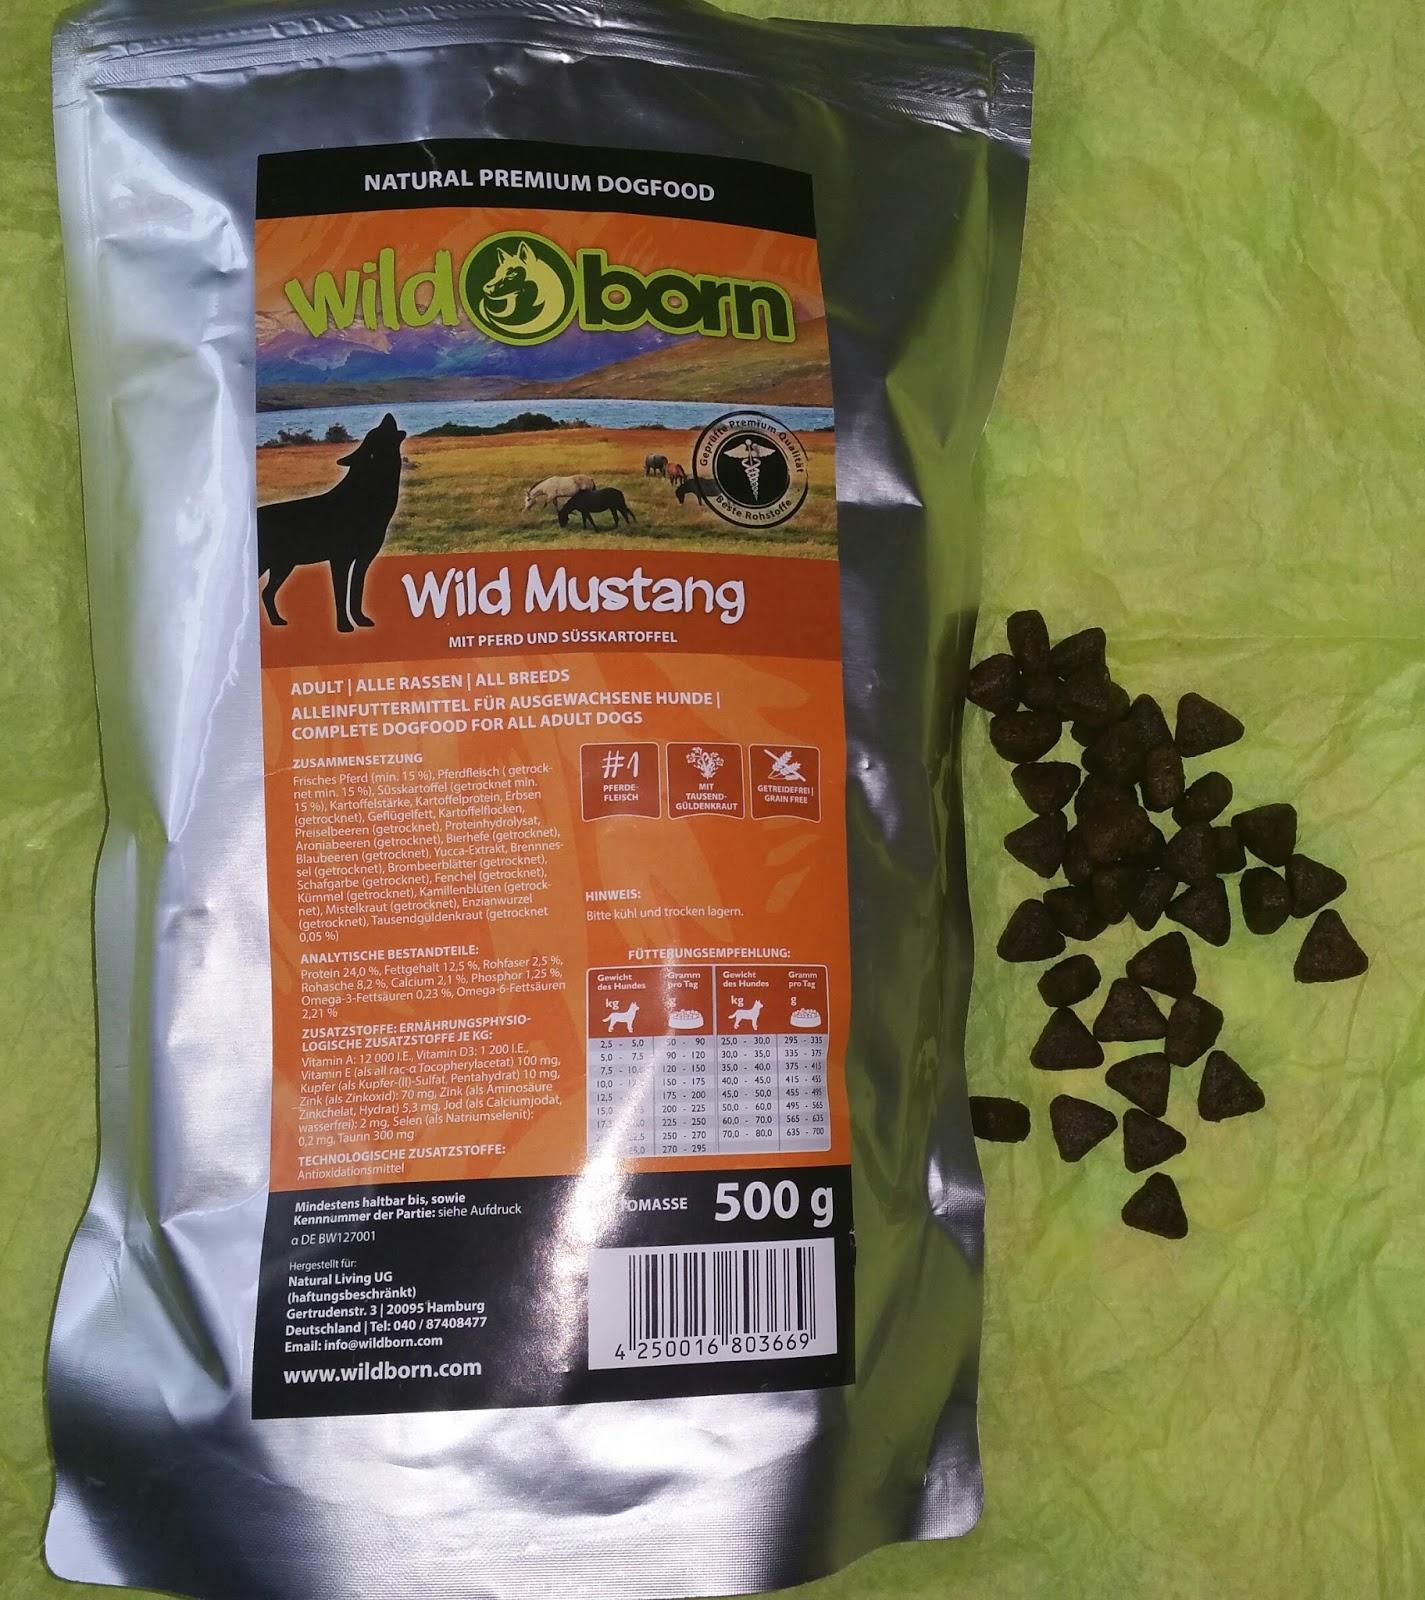 wildborn natural premium dogfood. Black Bedroom Furniture Sets. Home Design Ideas